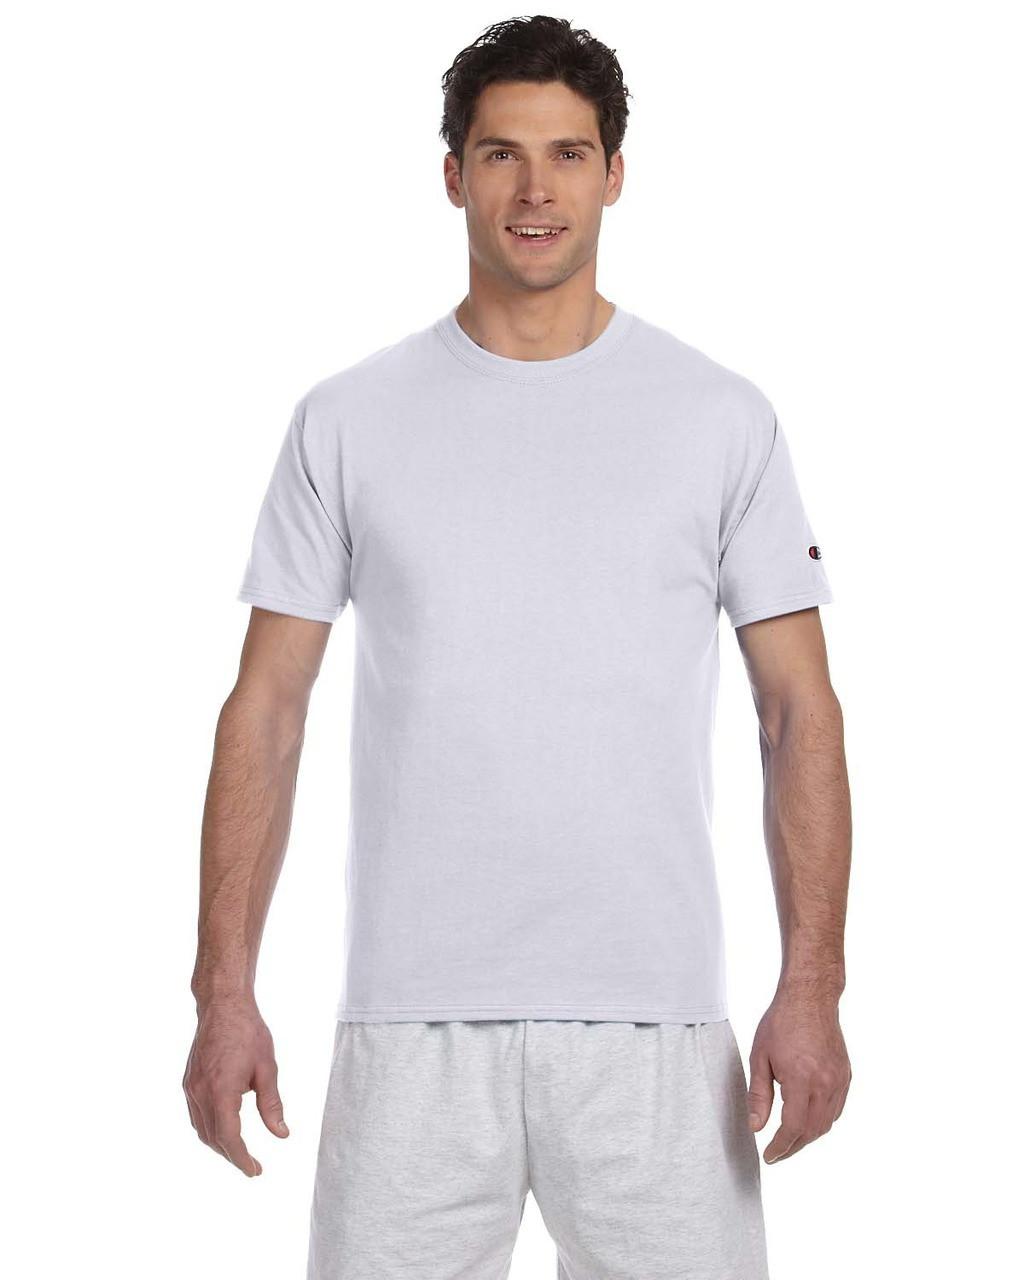 aea6d690 Champion T525C Adult 6 oz. Short-Sleeve T-Shirt - ClothingAuthority.com